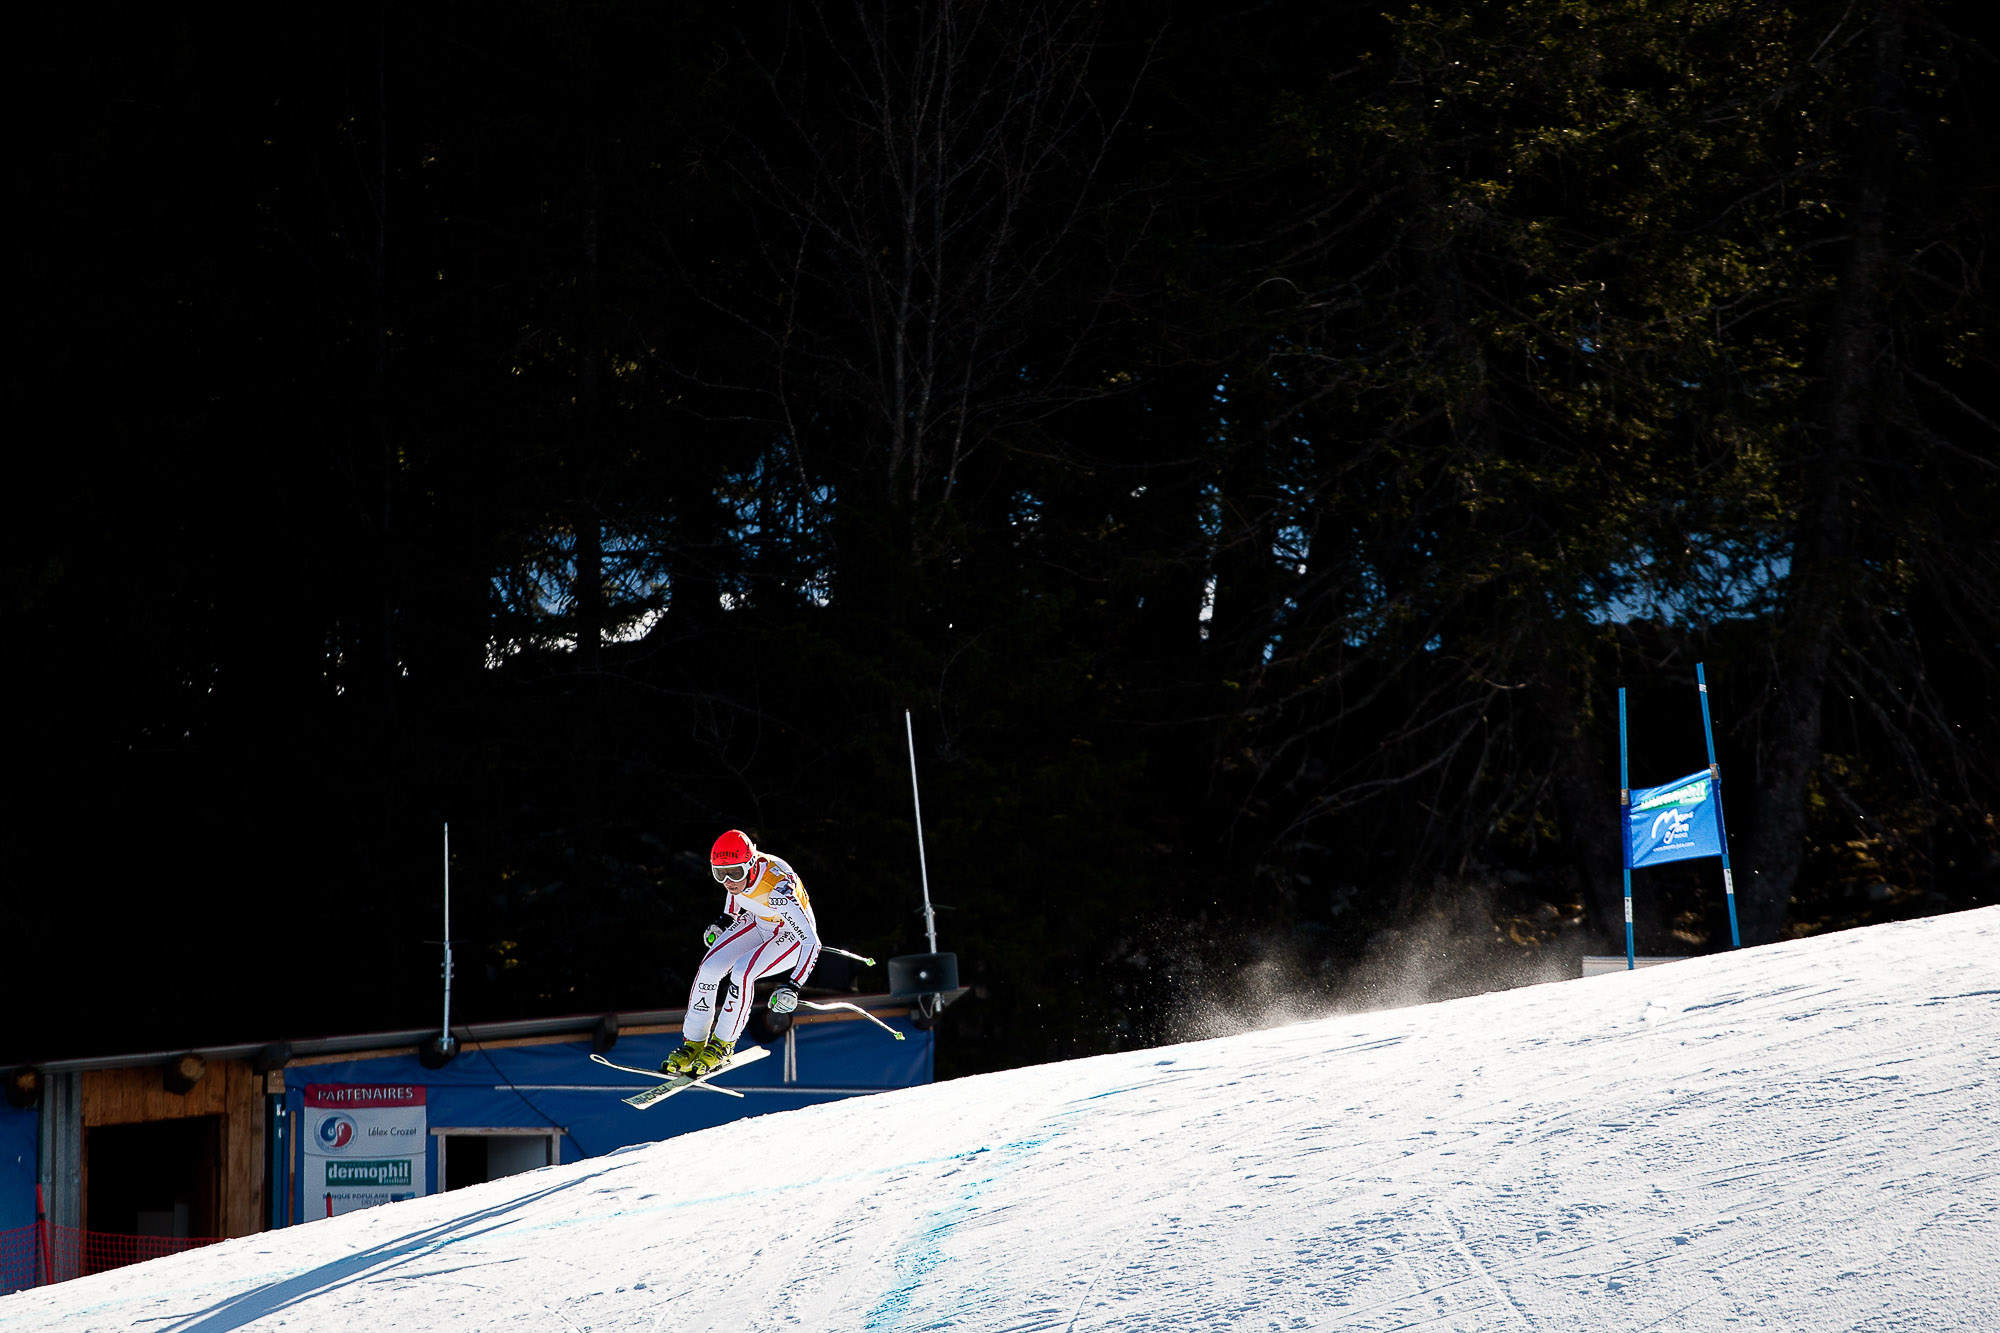 Coupe_Europe_ski_dames-75.jpg